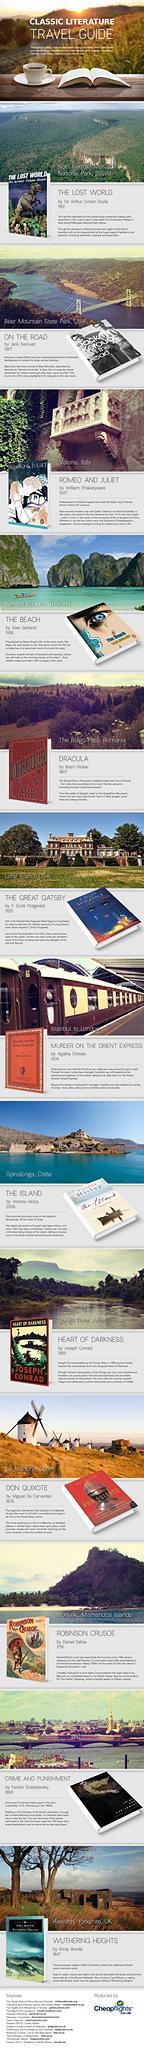 Classic-Literature-Travel-Guide1